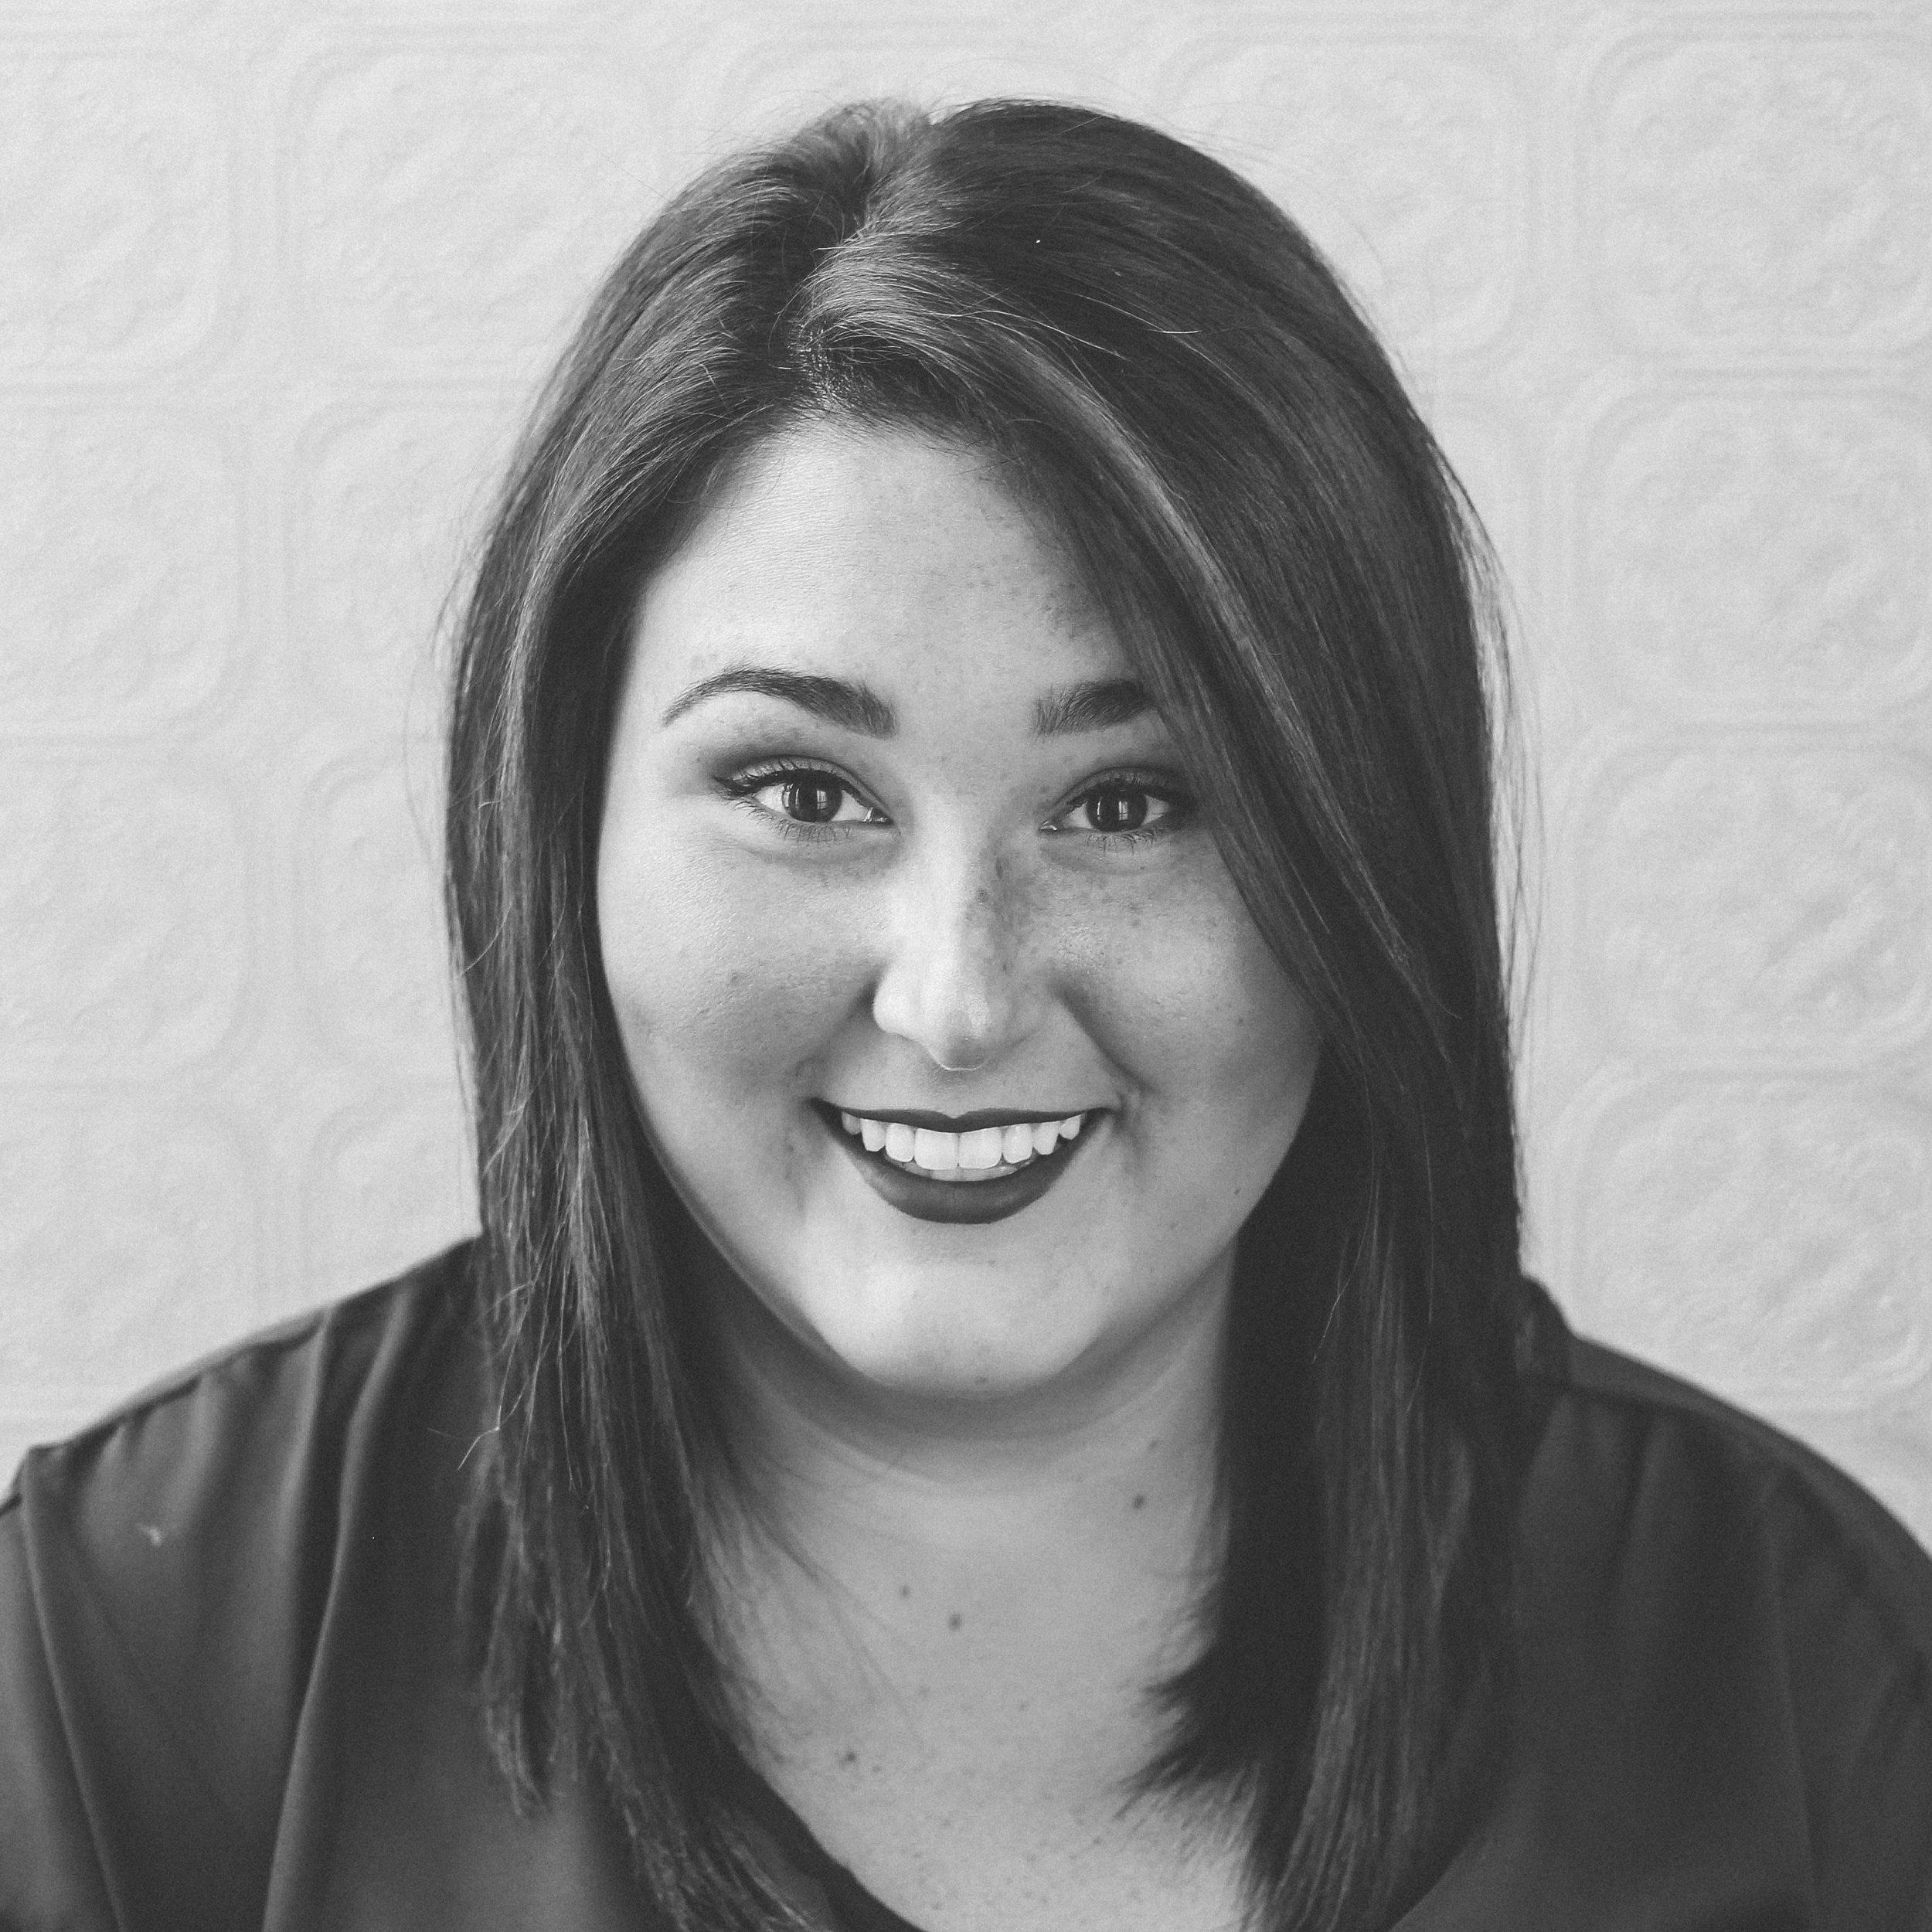 SAVANNAH GARRETT  PURE TALENT STYLIST  WITH BELLA LAGO SINCE 2015